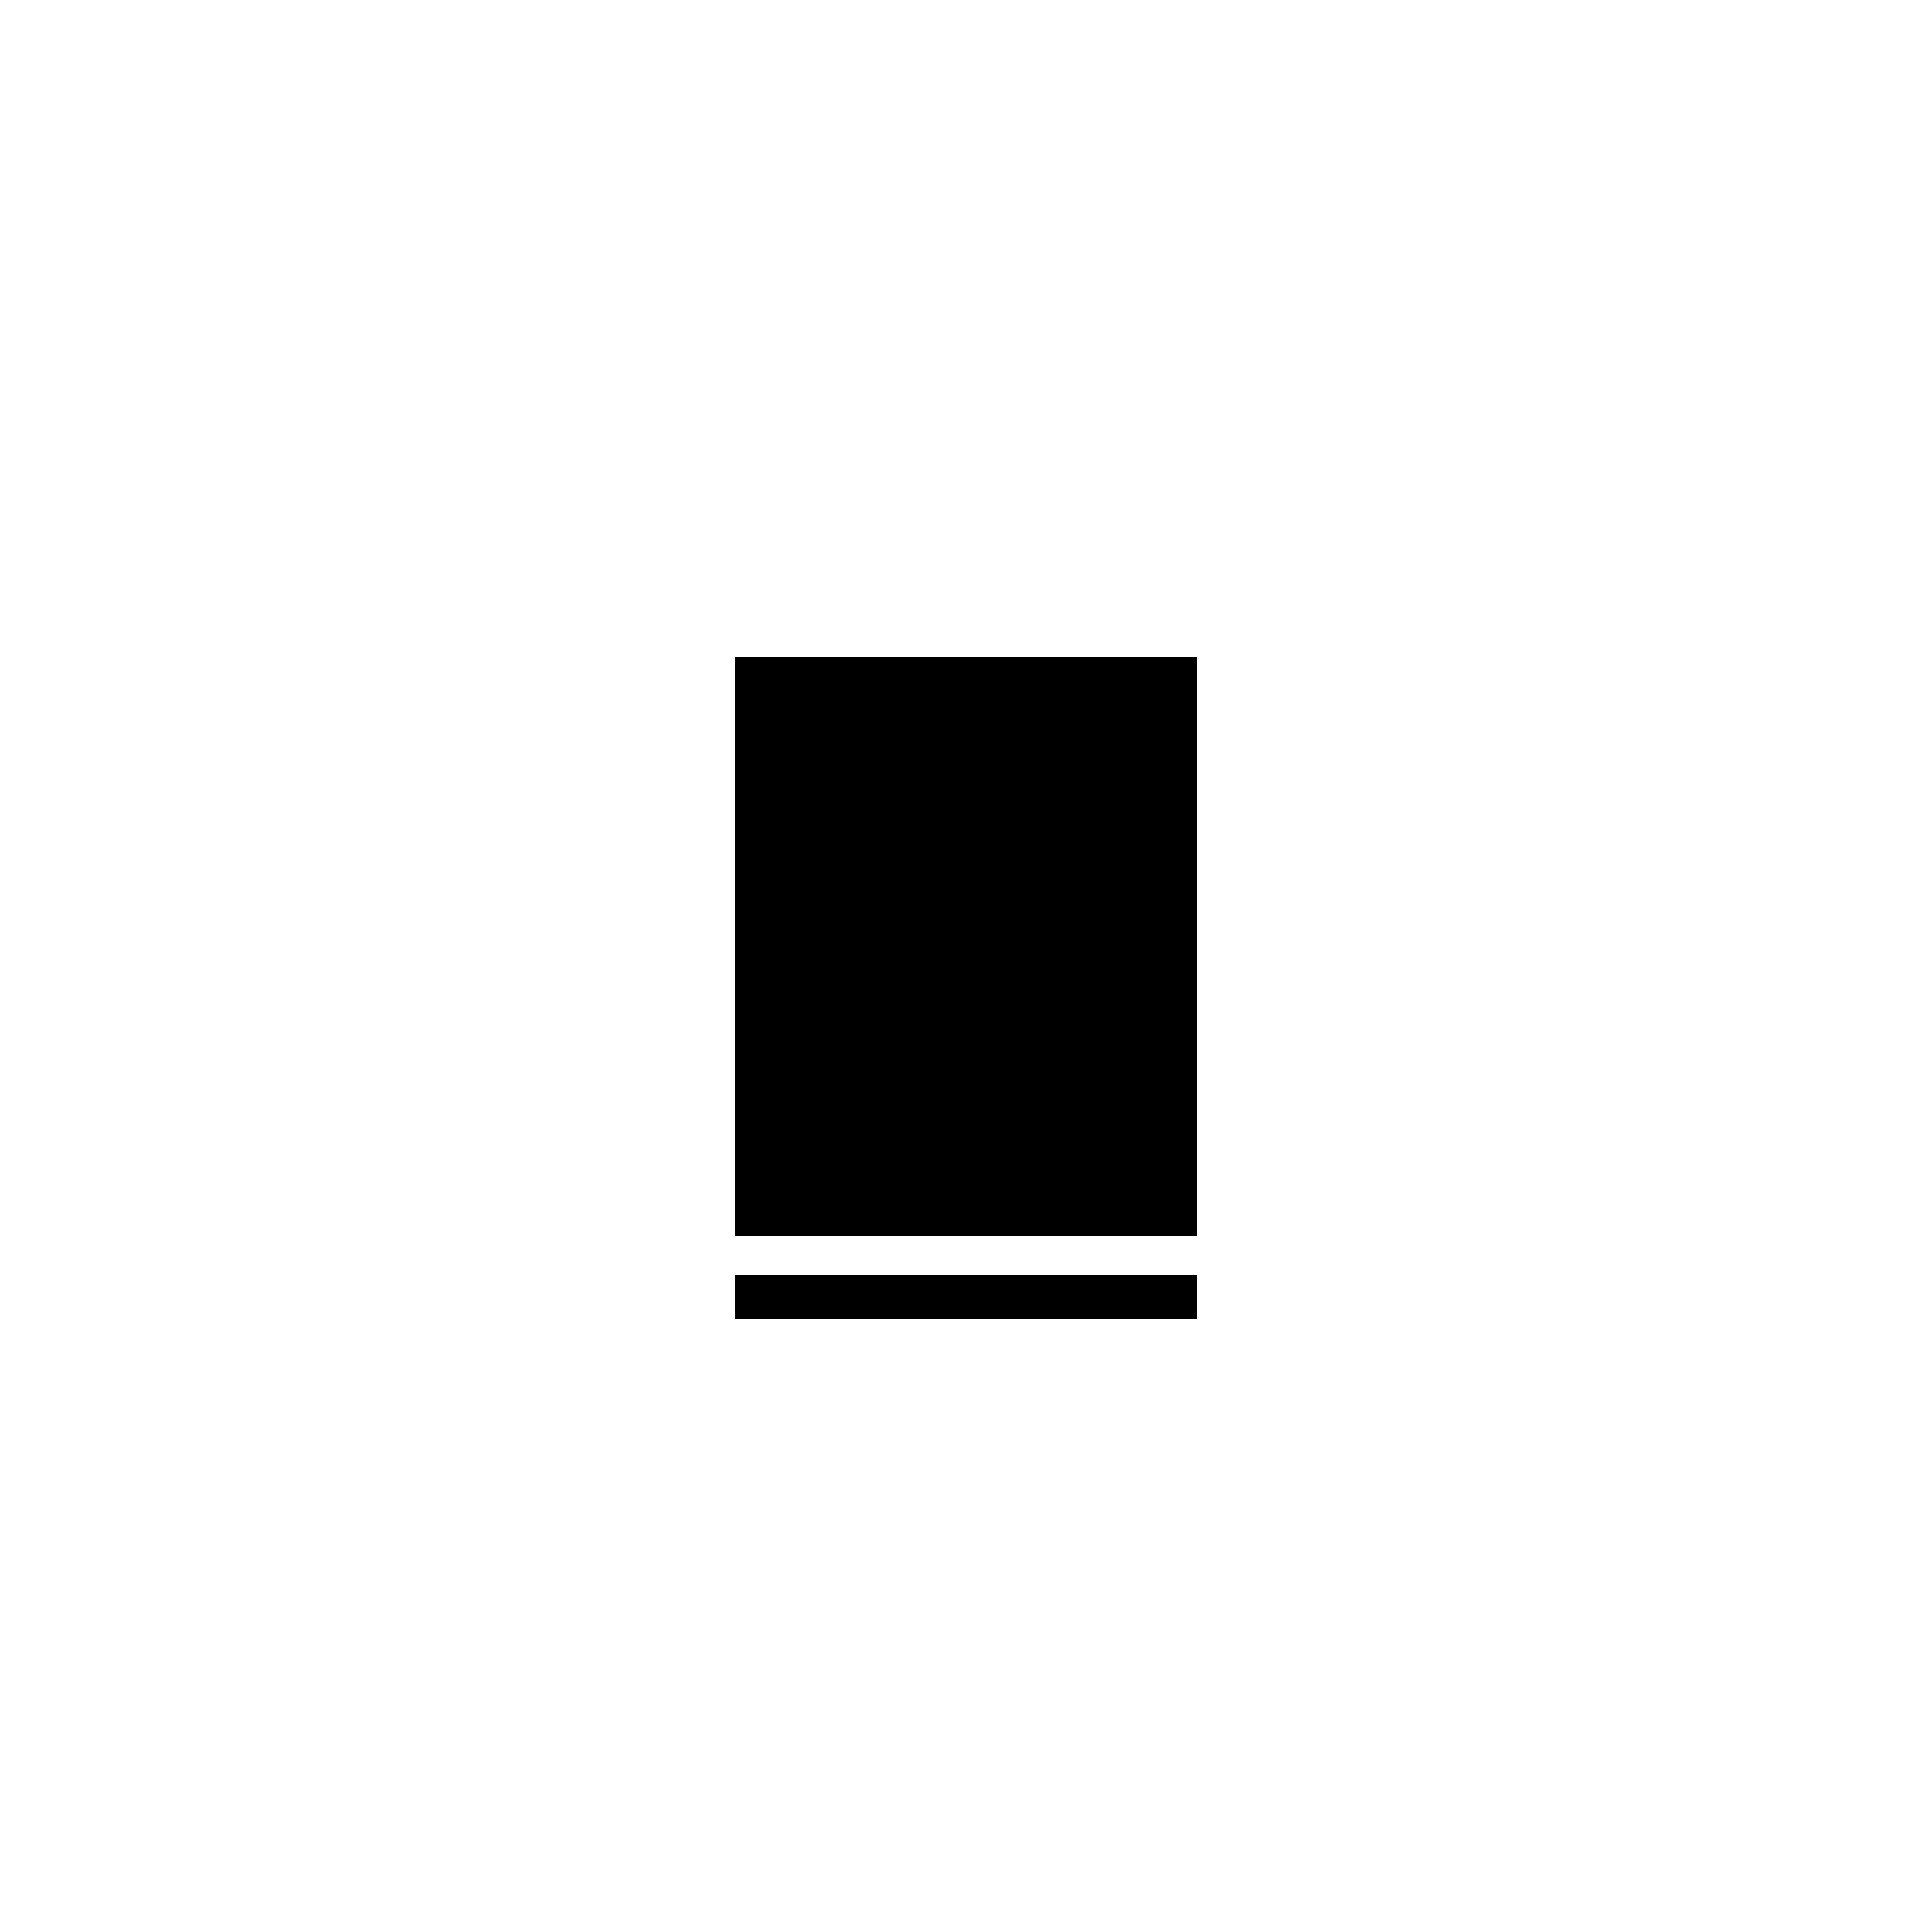 Graphene-X